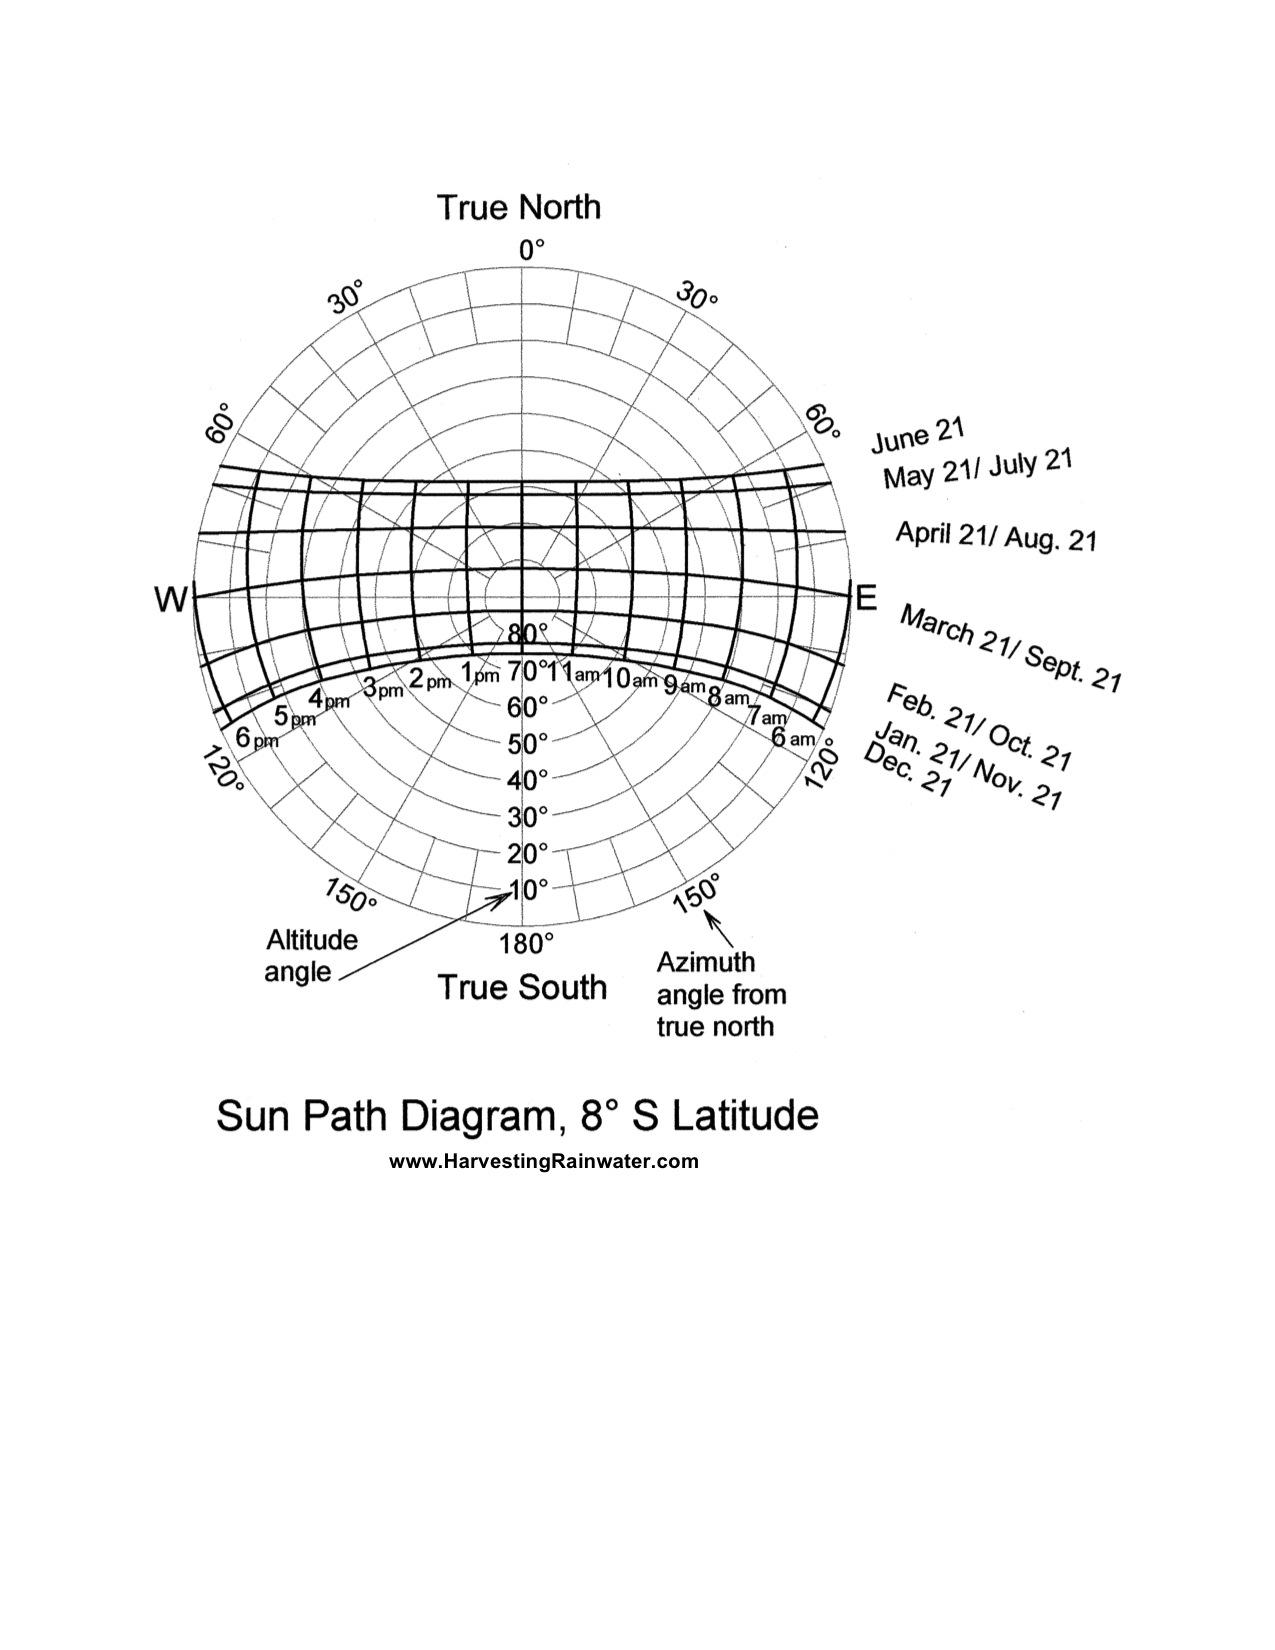 Sun Path Diagram 8o S Latitude